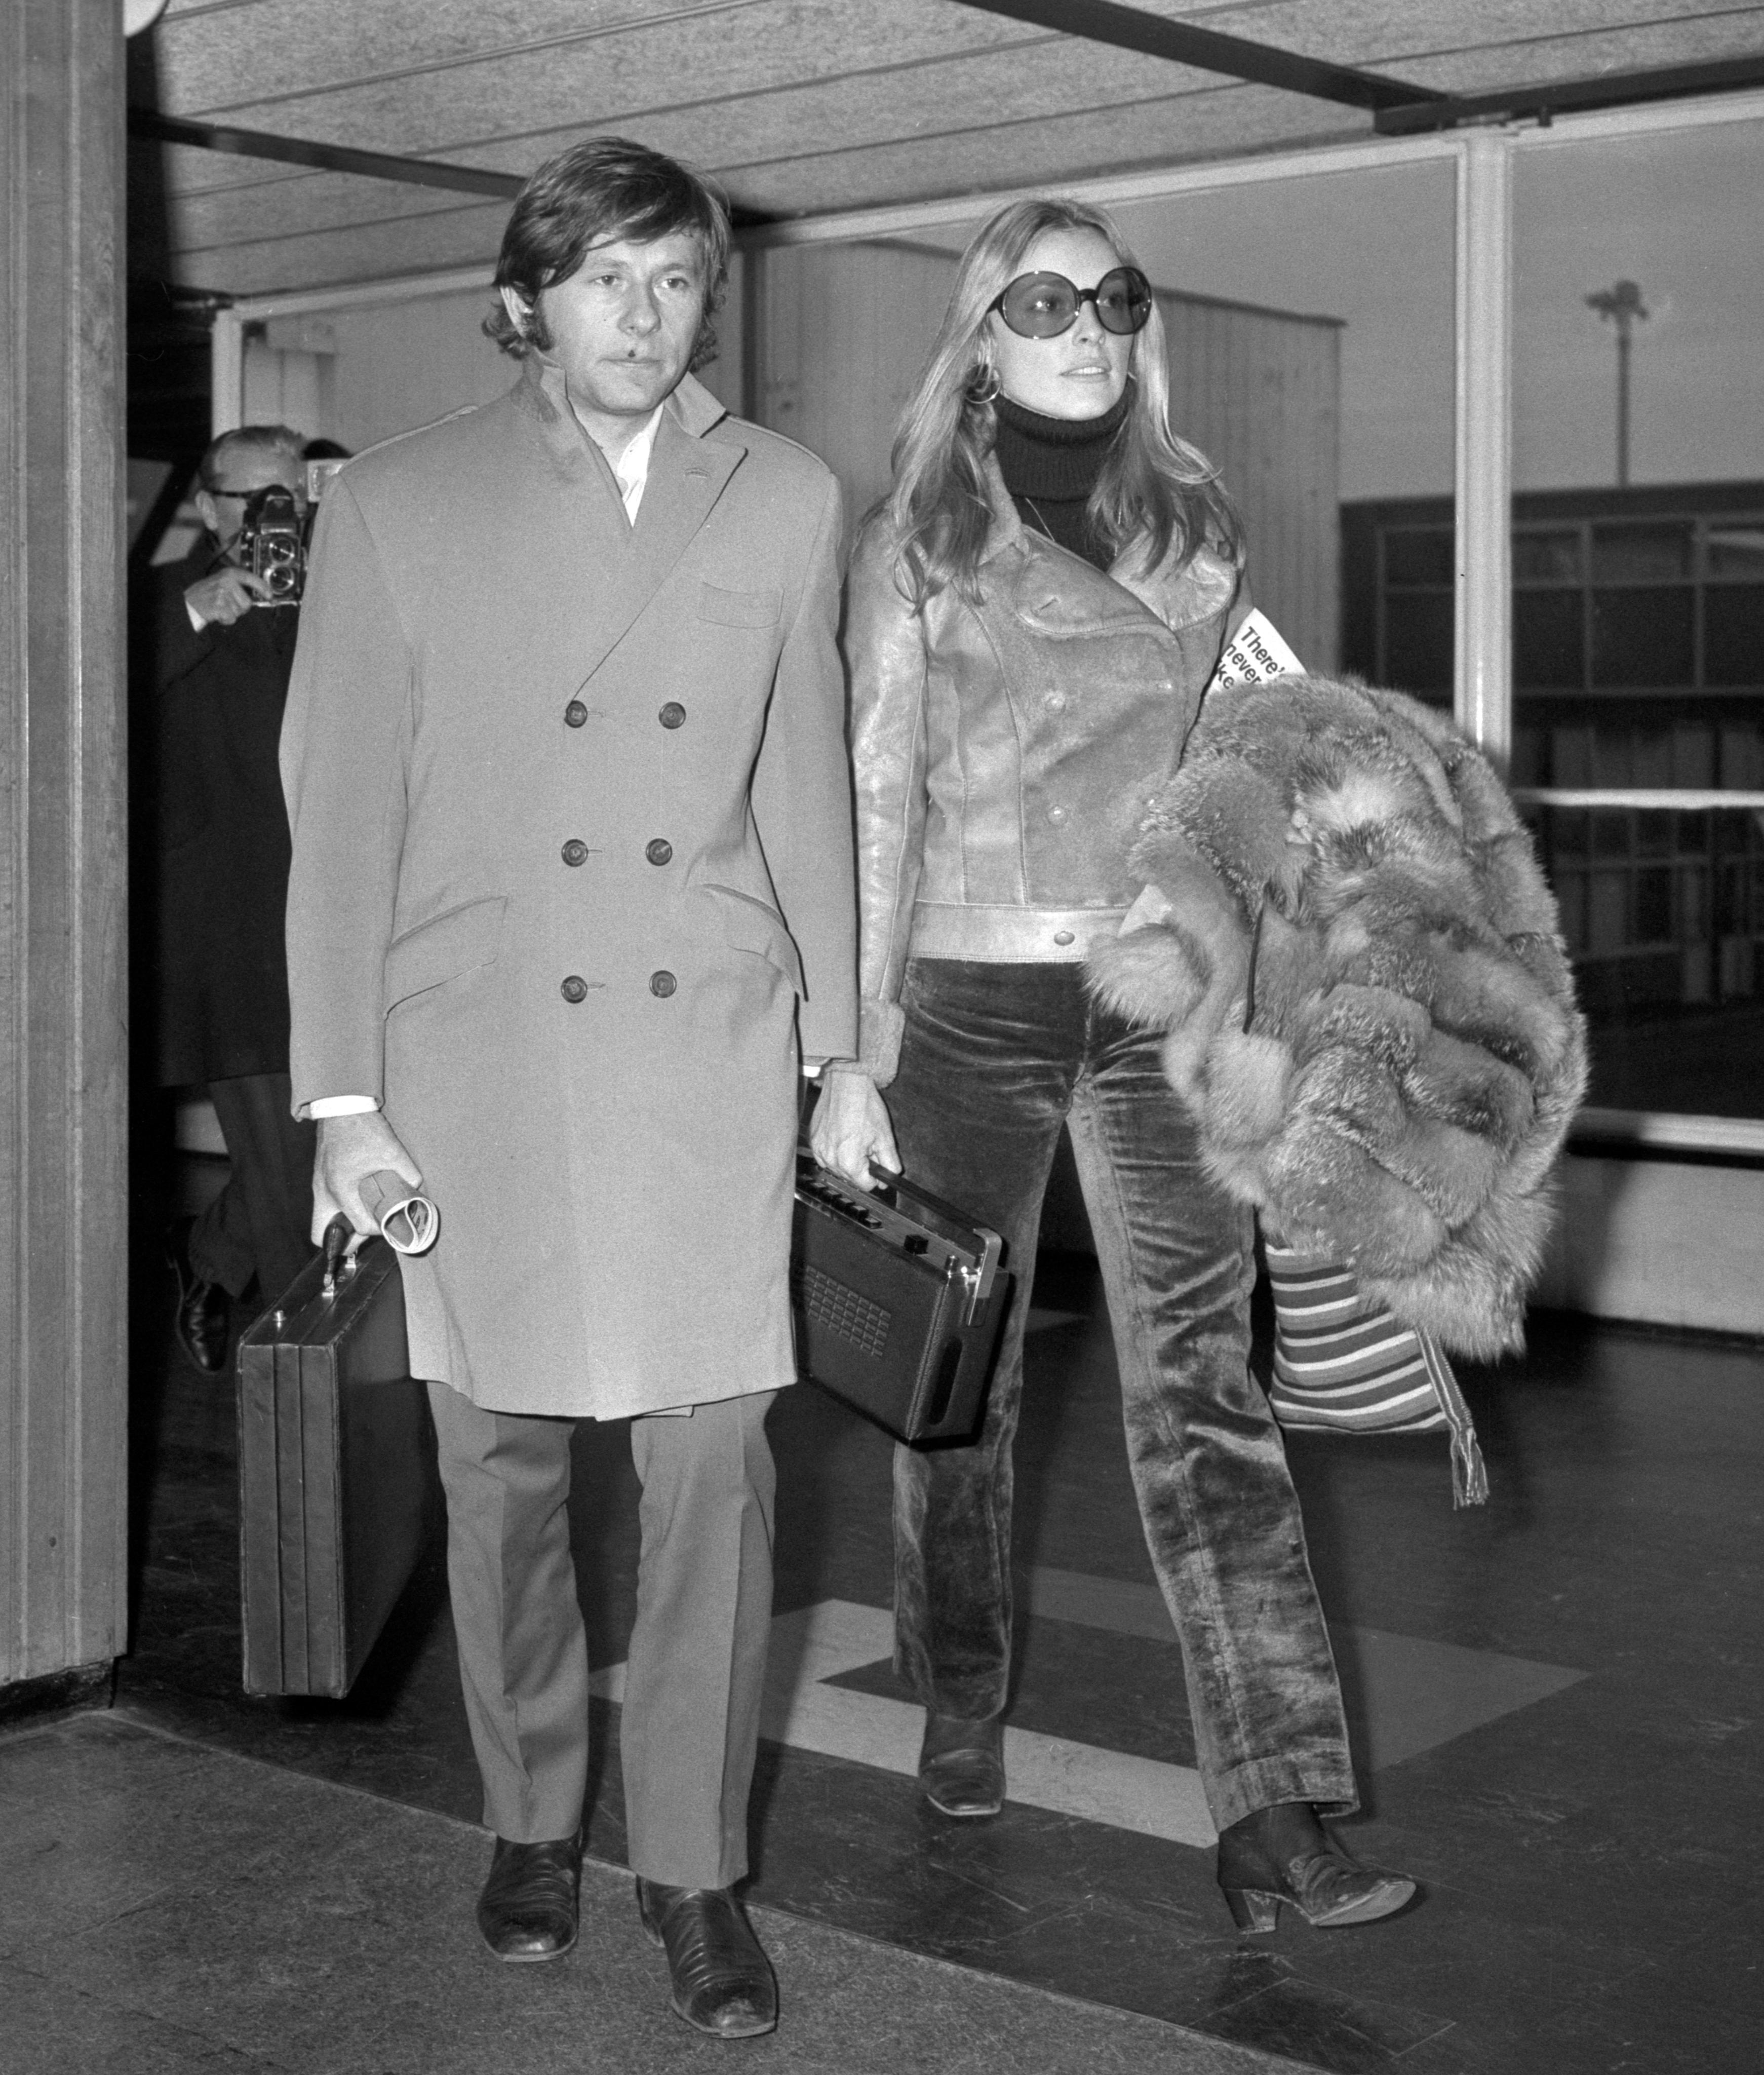 Sharon and her husband Roman Polanski before her brutal murder. Credit: PA Images